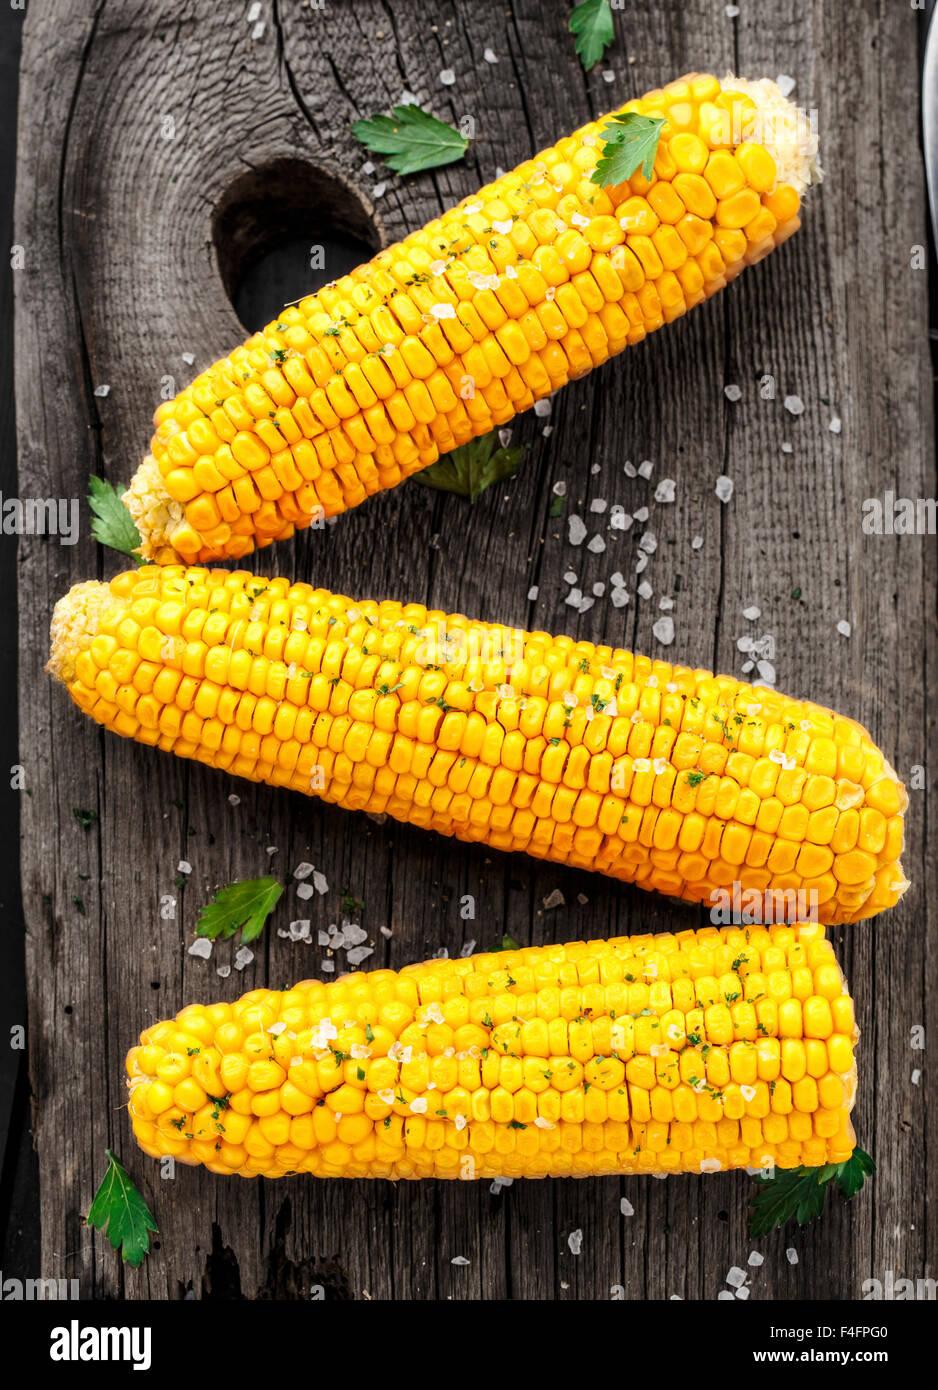 Sehr lecker gegrilltem Mais auf einem Holzbrett Stockbild